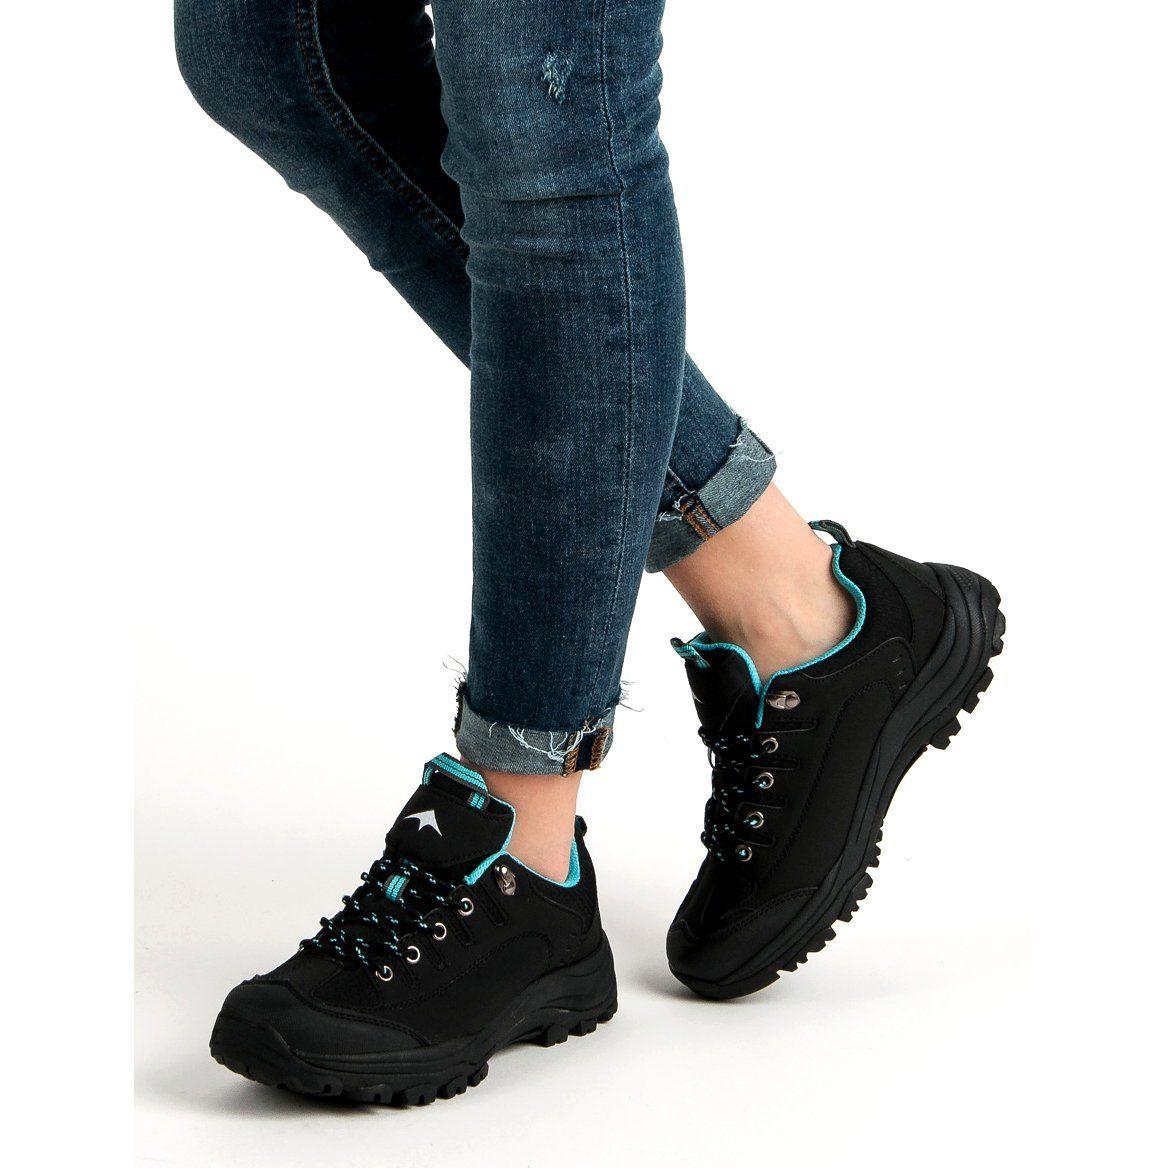 Czarne Buty Trekkingowe Trending Shoes Shoes Boots